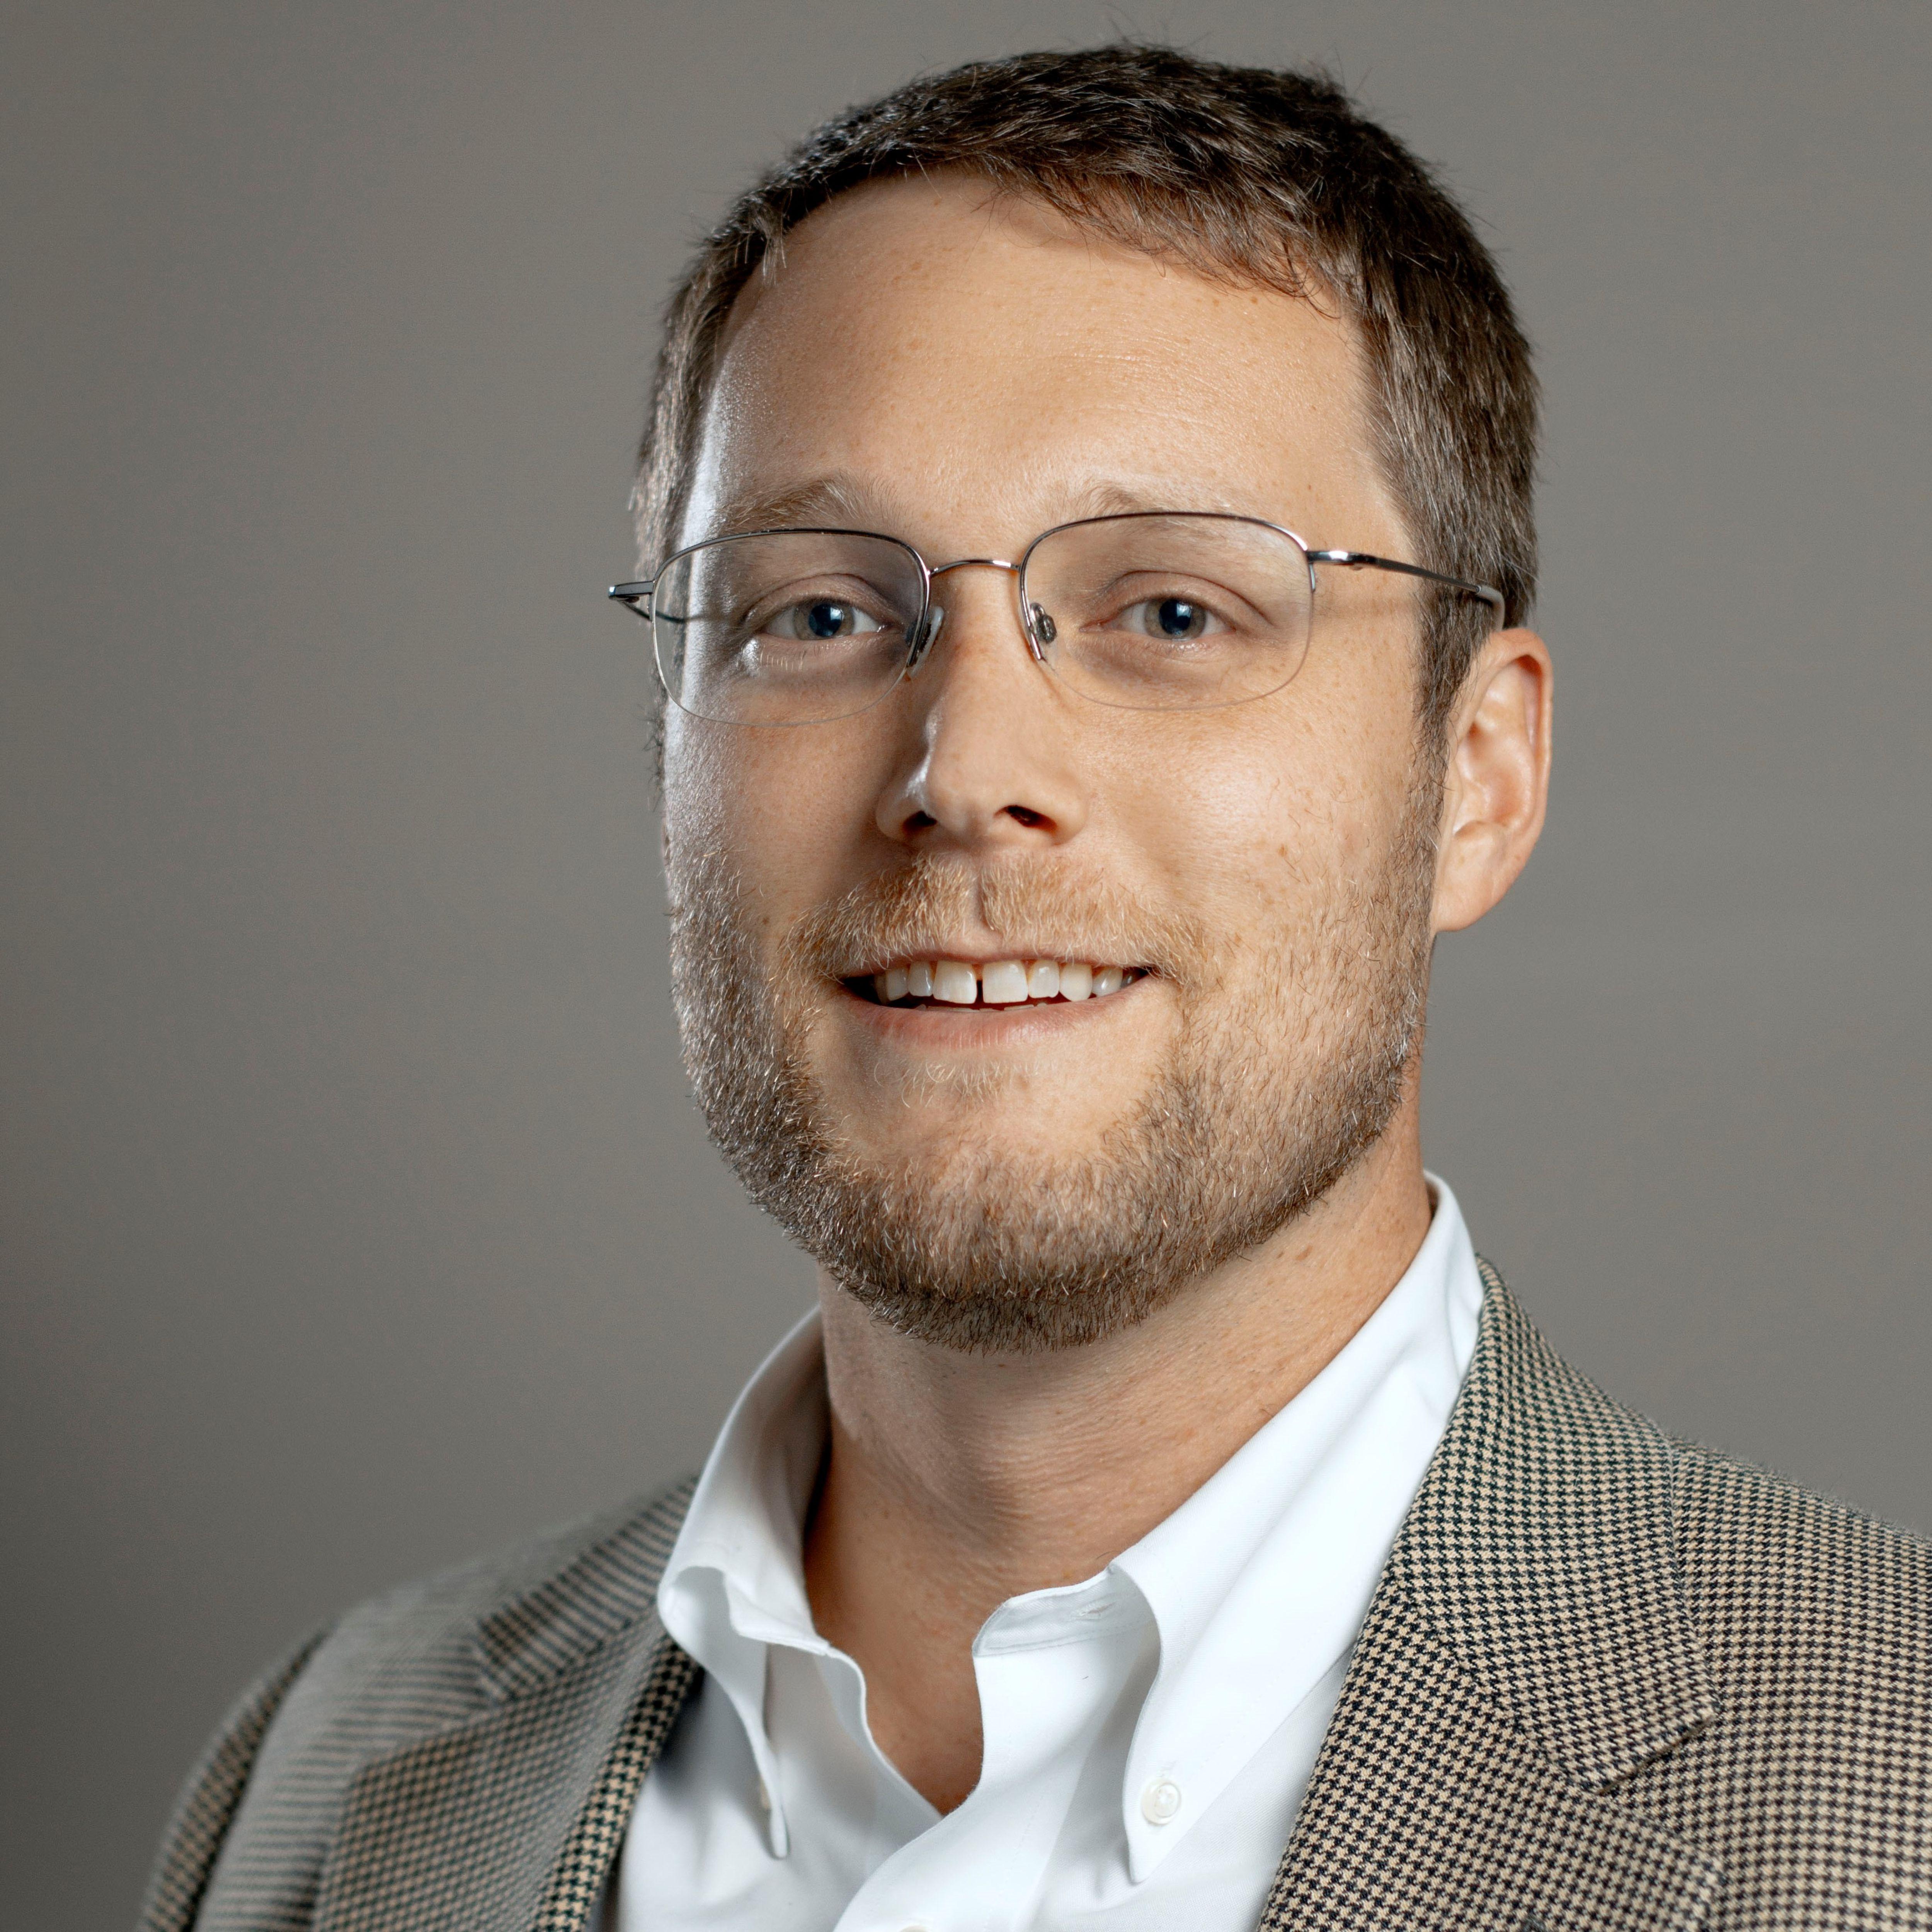 Daniel Broderick